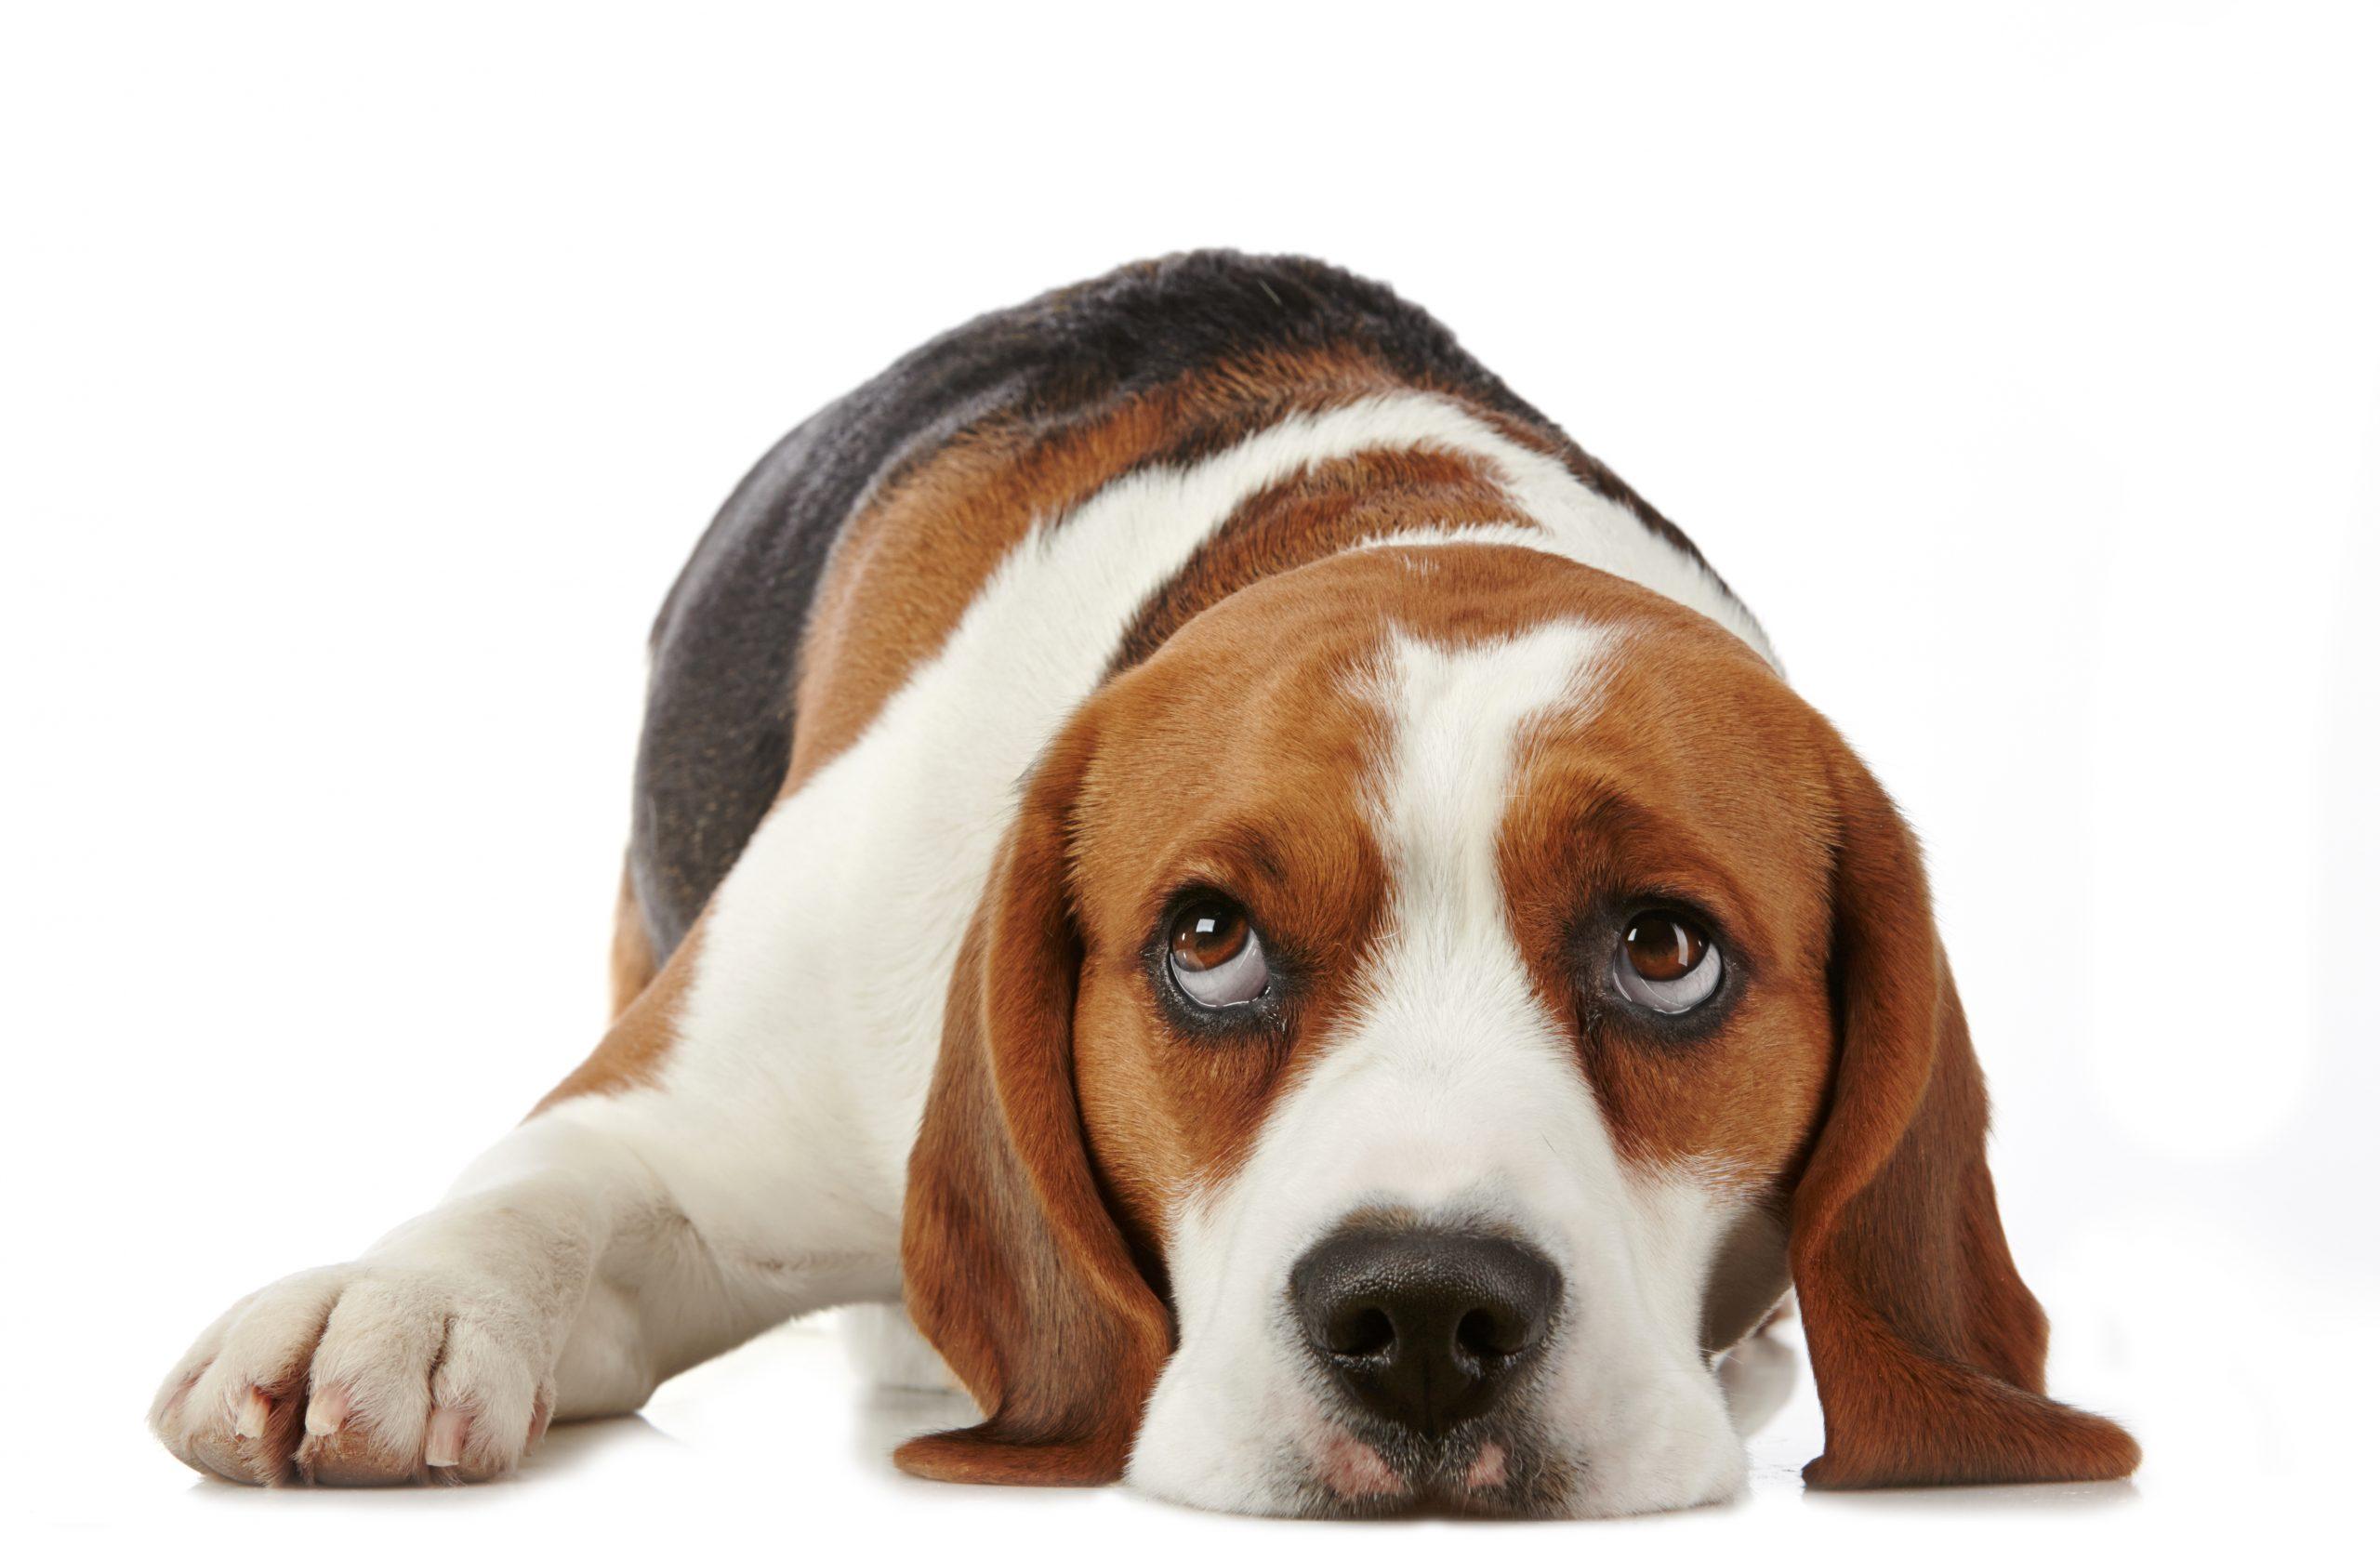 emotional support animal, dog